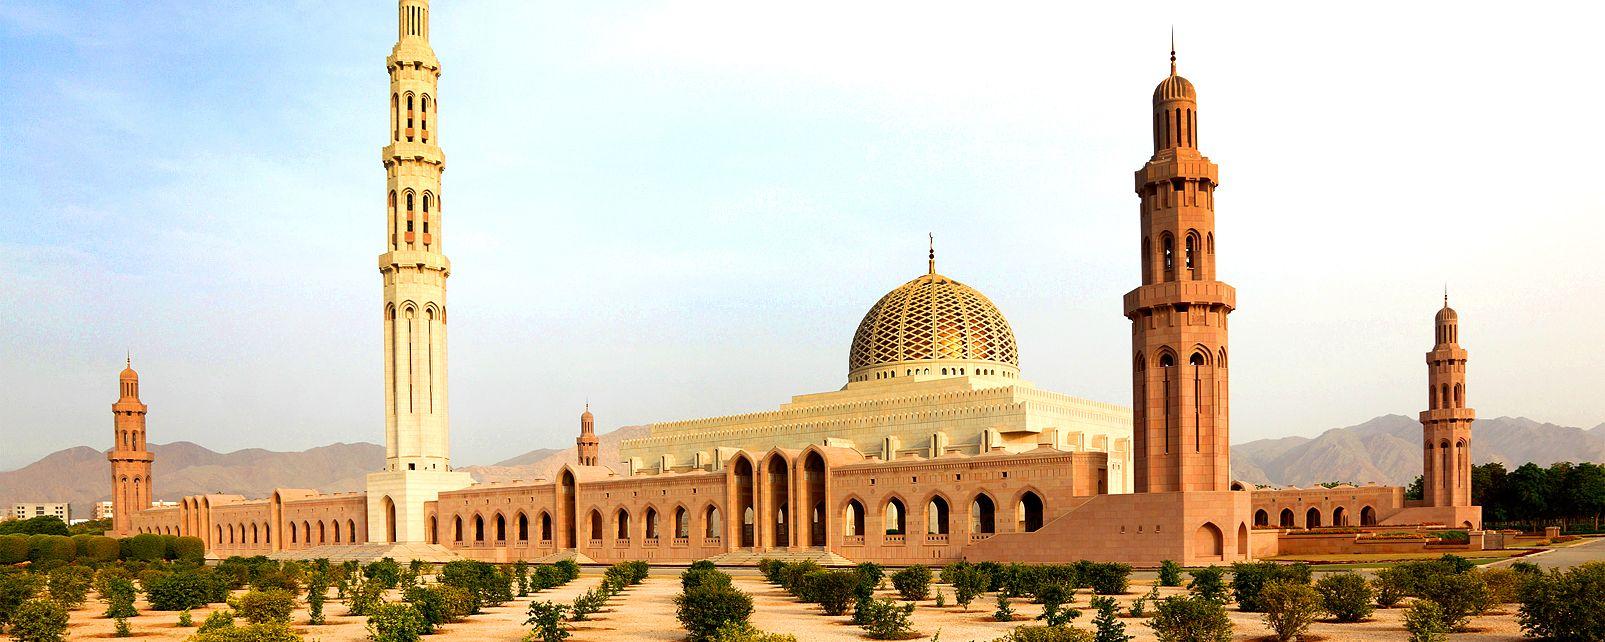 The Great Sultan Qaboos Mosque Oman